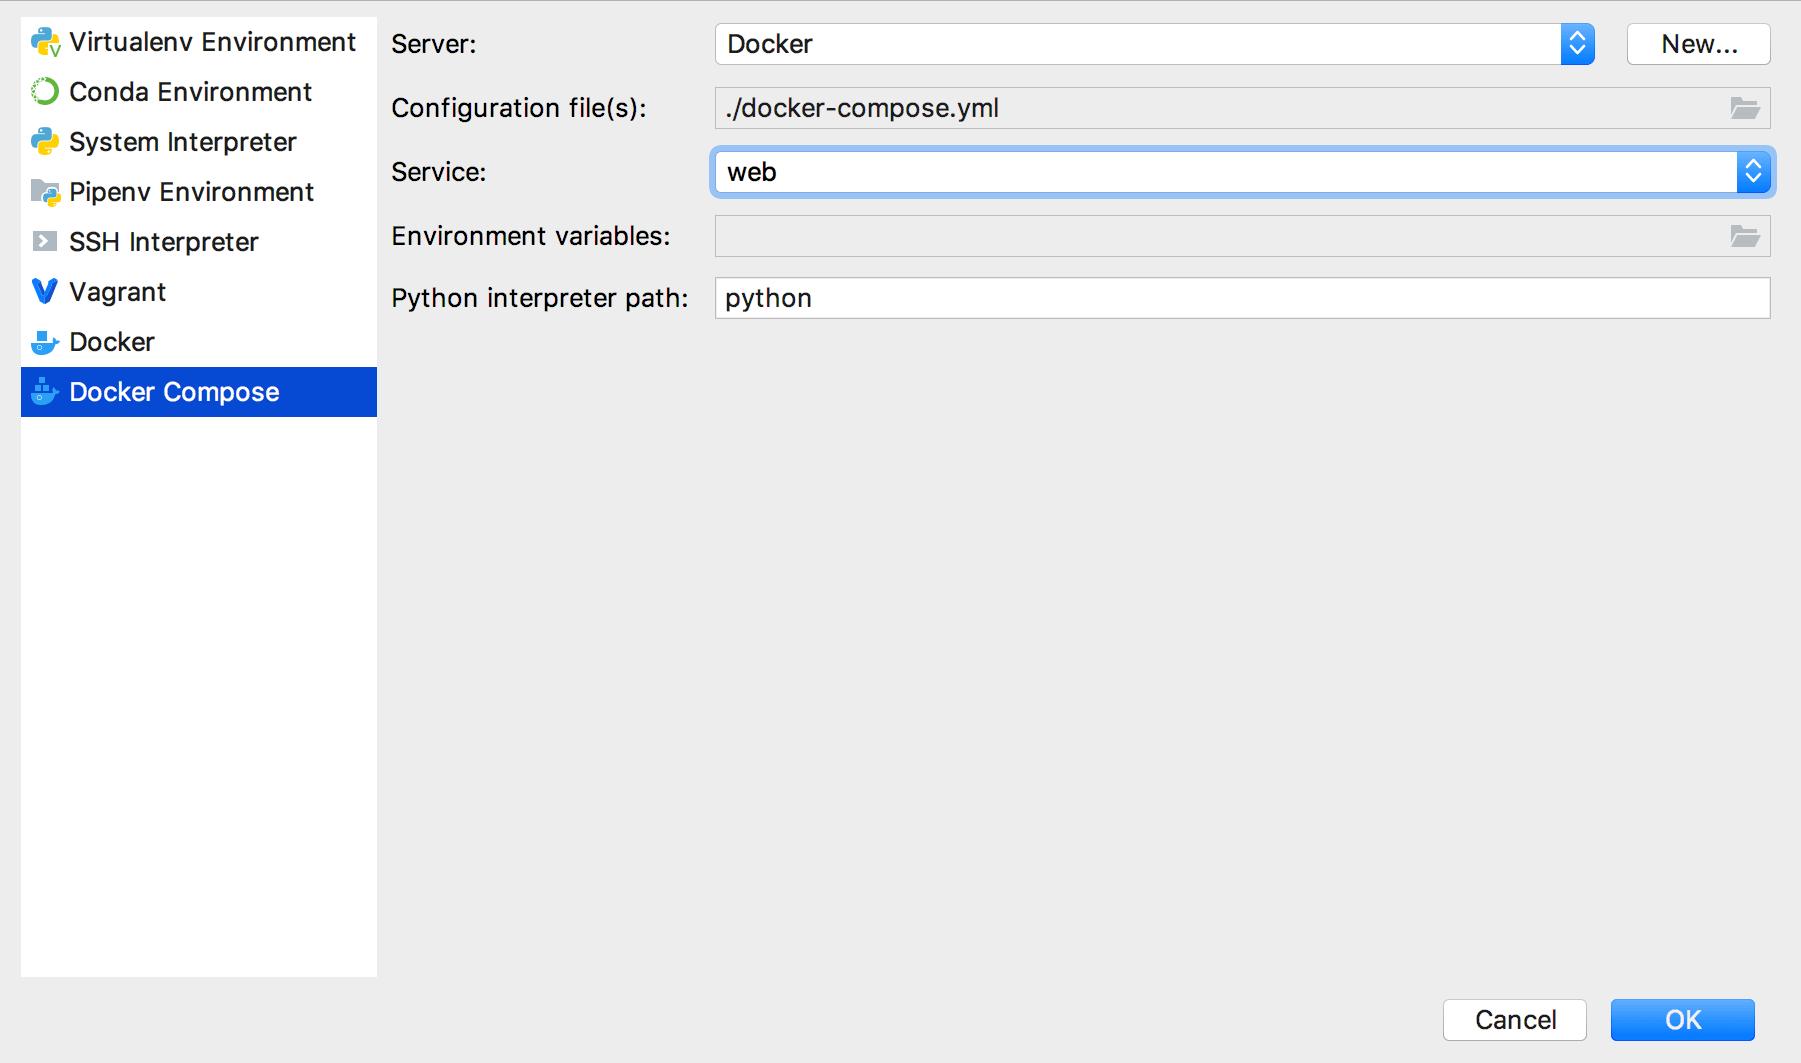 Configure remote Python interpreter